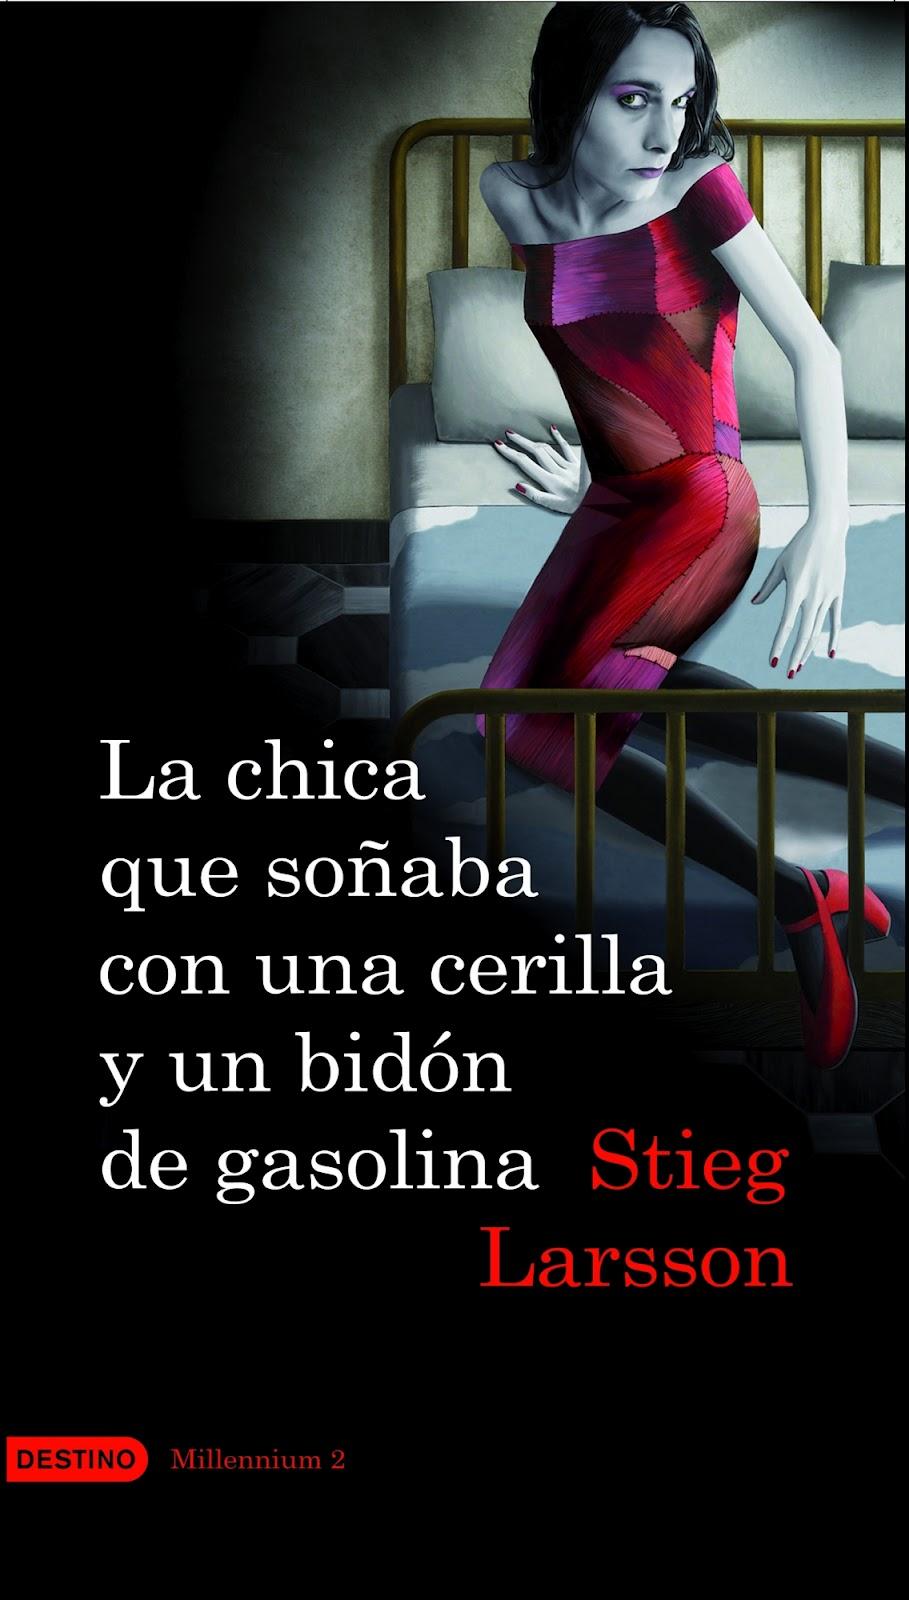 http://1.bp.blogspot.com/-LhOtpHdin-Q/T2eVud_kQXI/AAAAAAAAARE/gjs9Qnqw0MM/s1600/la-chica-que-sonaba-con-una-cerilla-y-un-bidon-de-gasolina-ebook-9788423342884.jpg